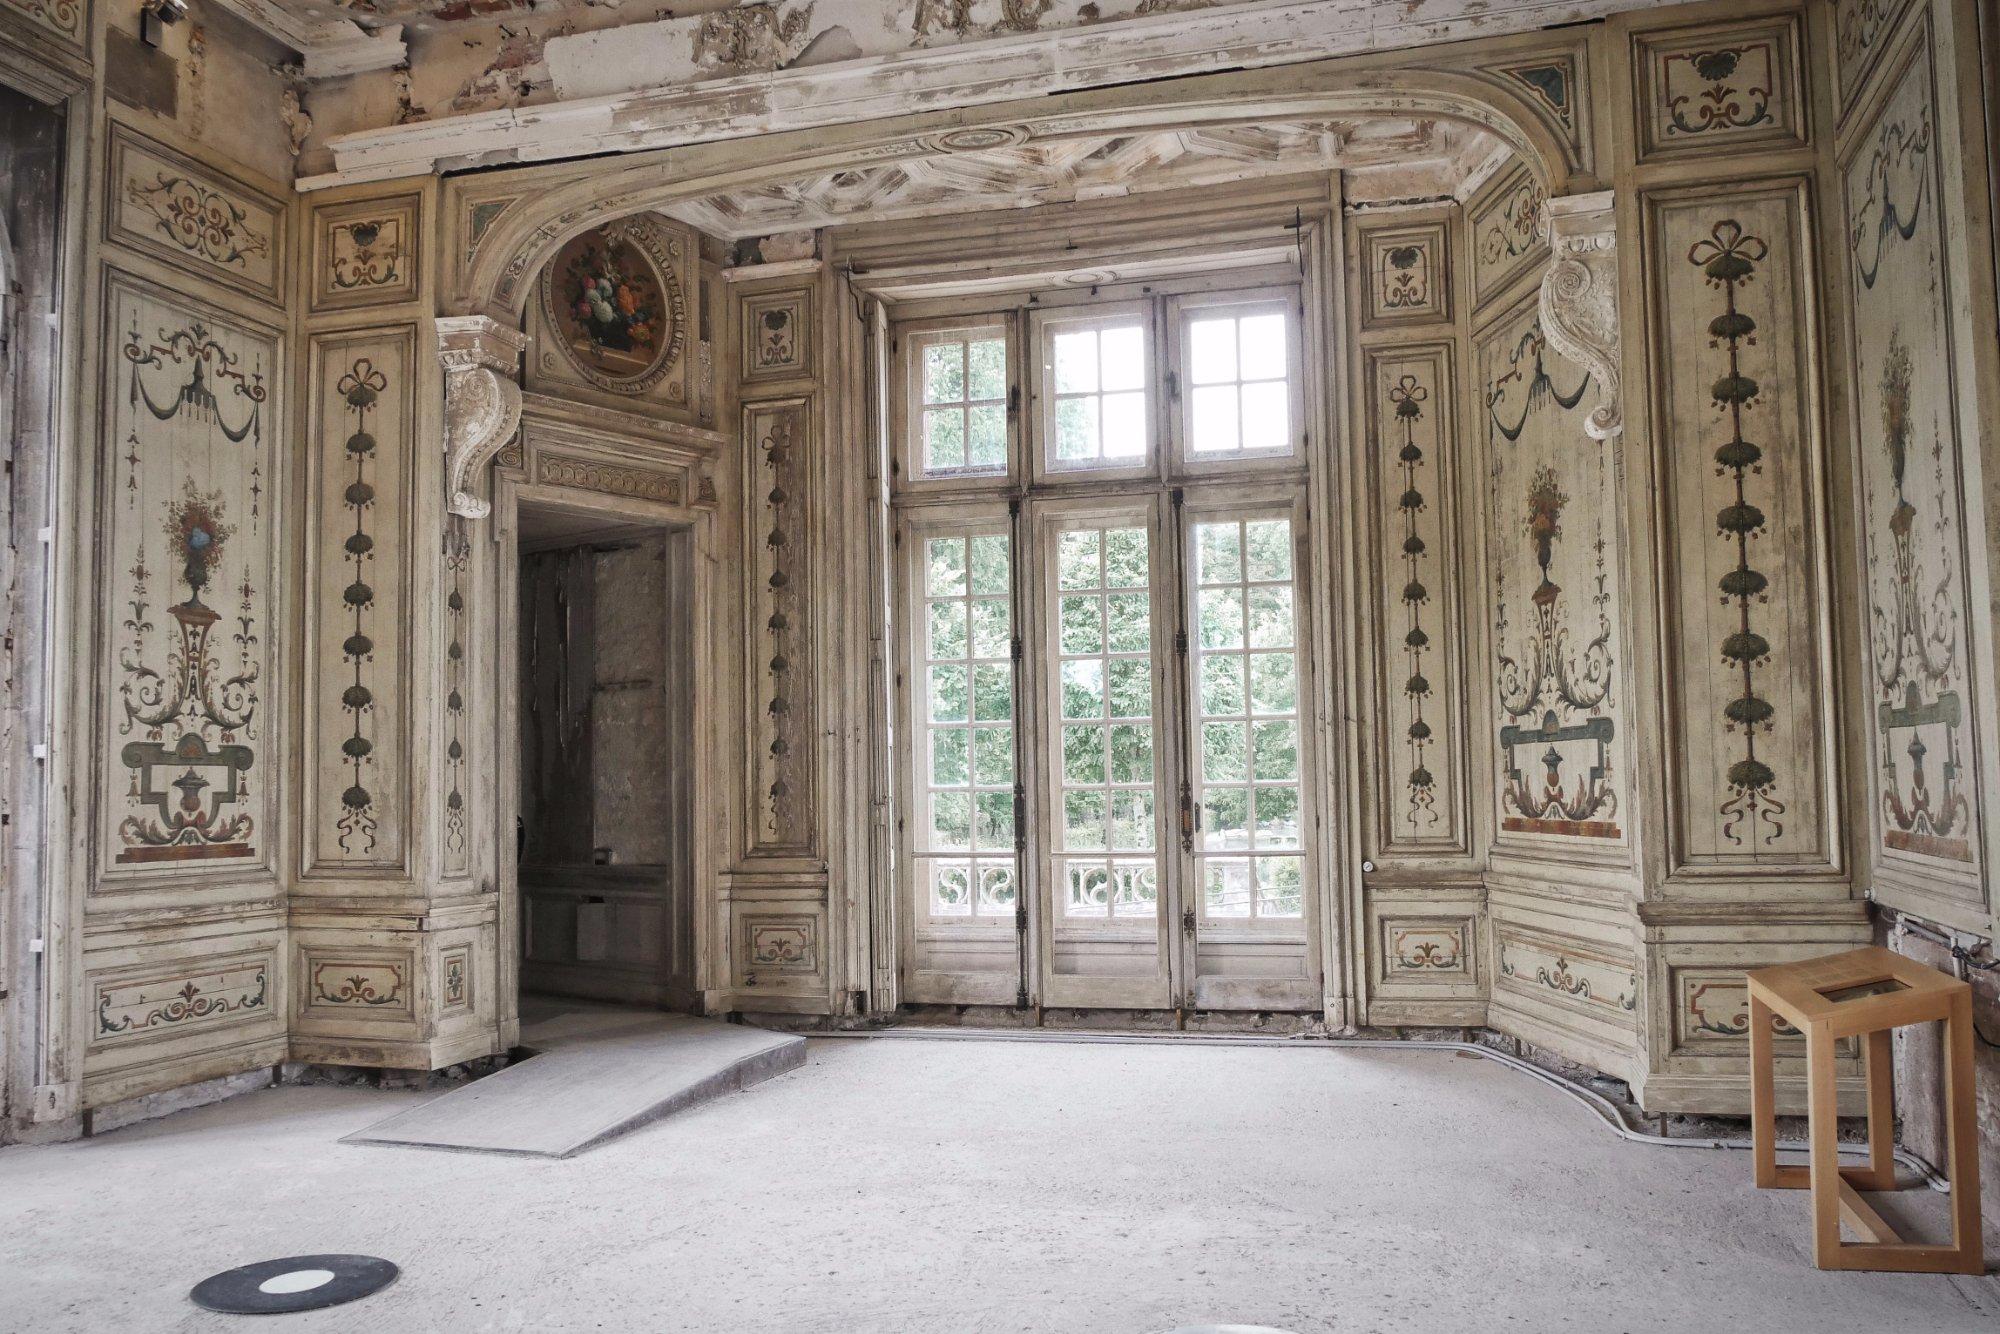 454-chateau-de-trevarez.jpg